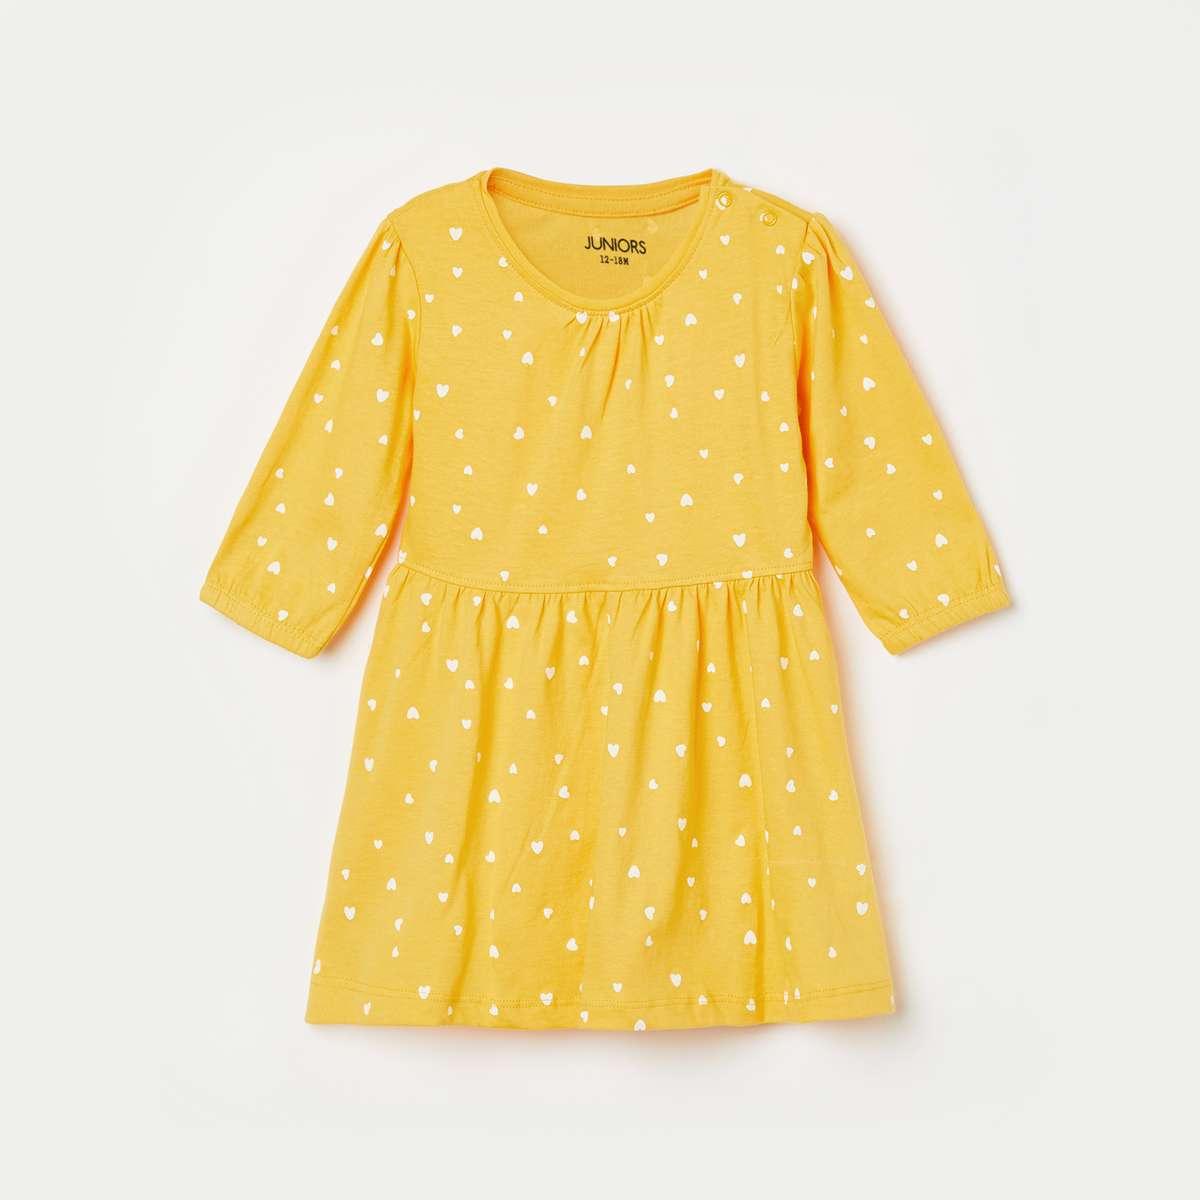 3.JUNIORS Girls Printed Round Neck A-line Dress